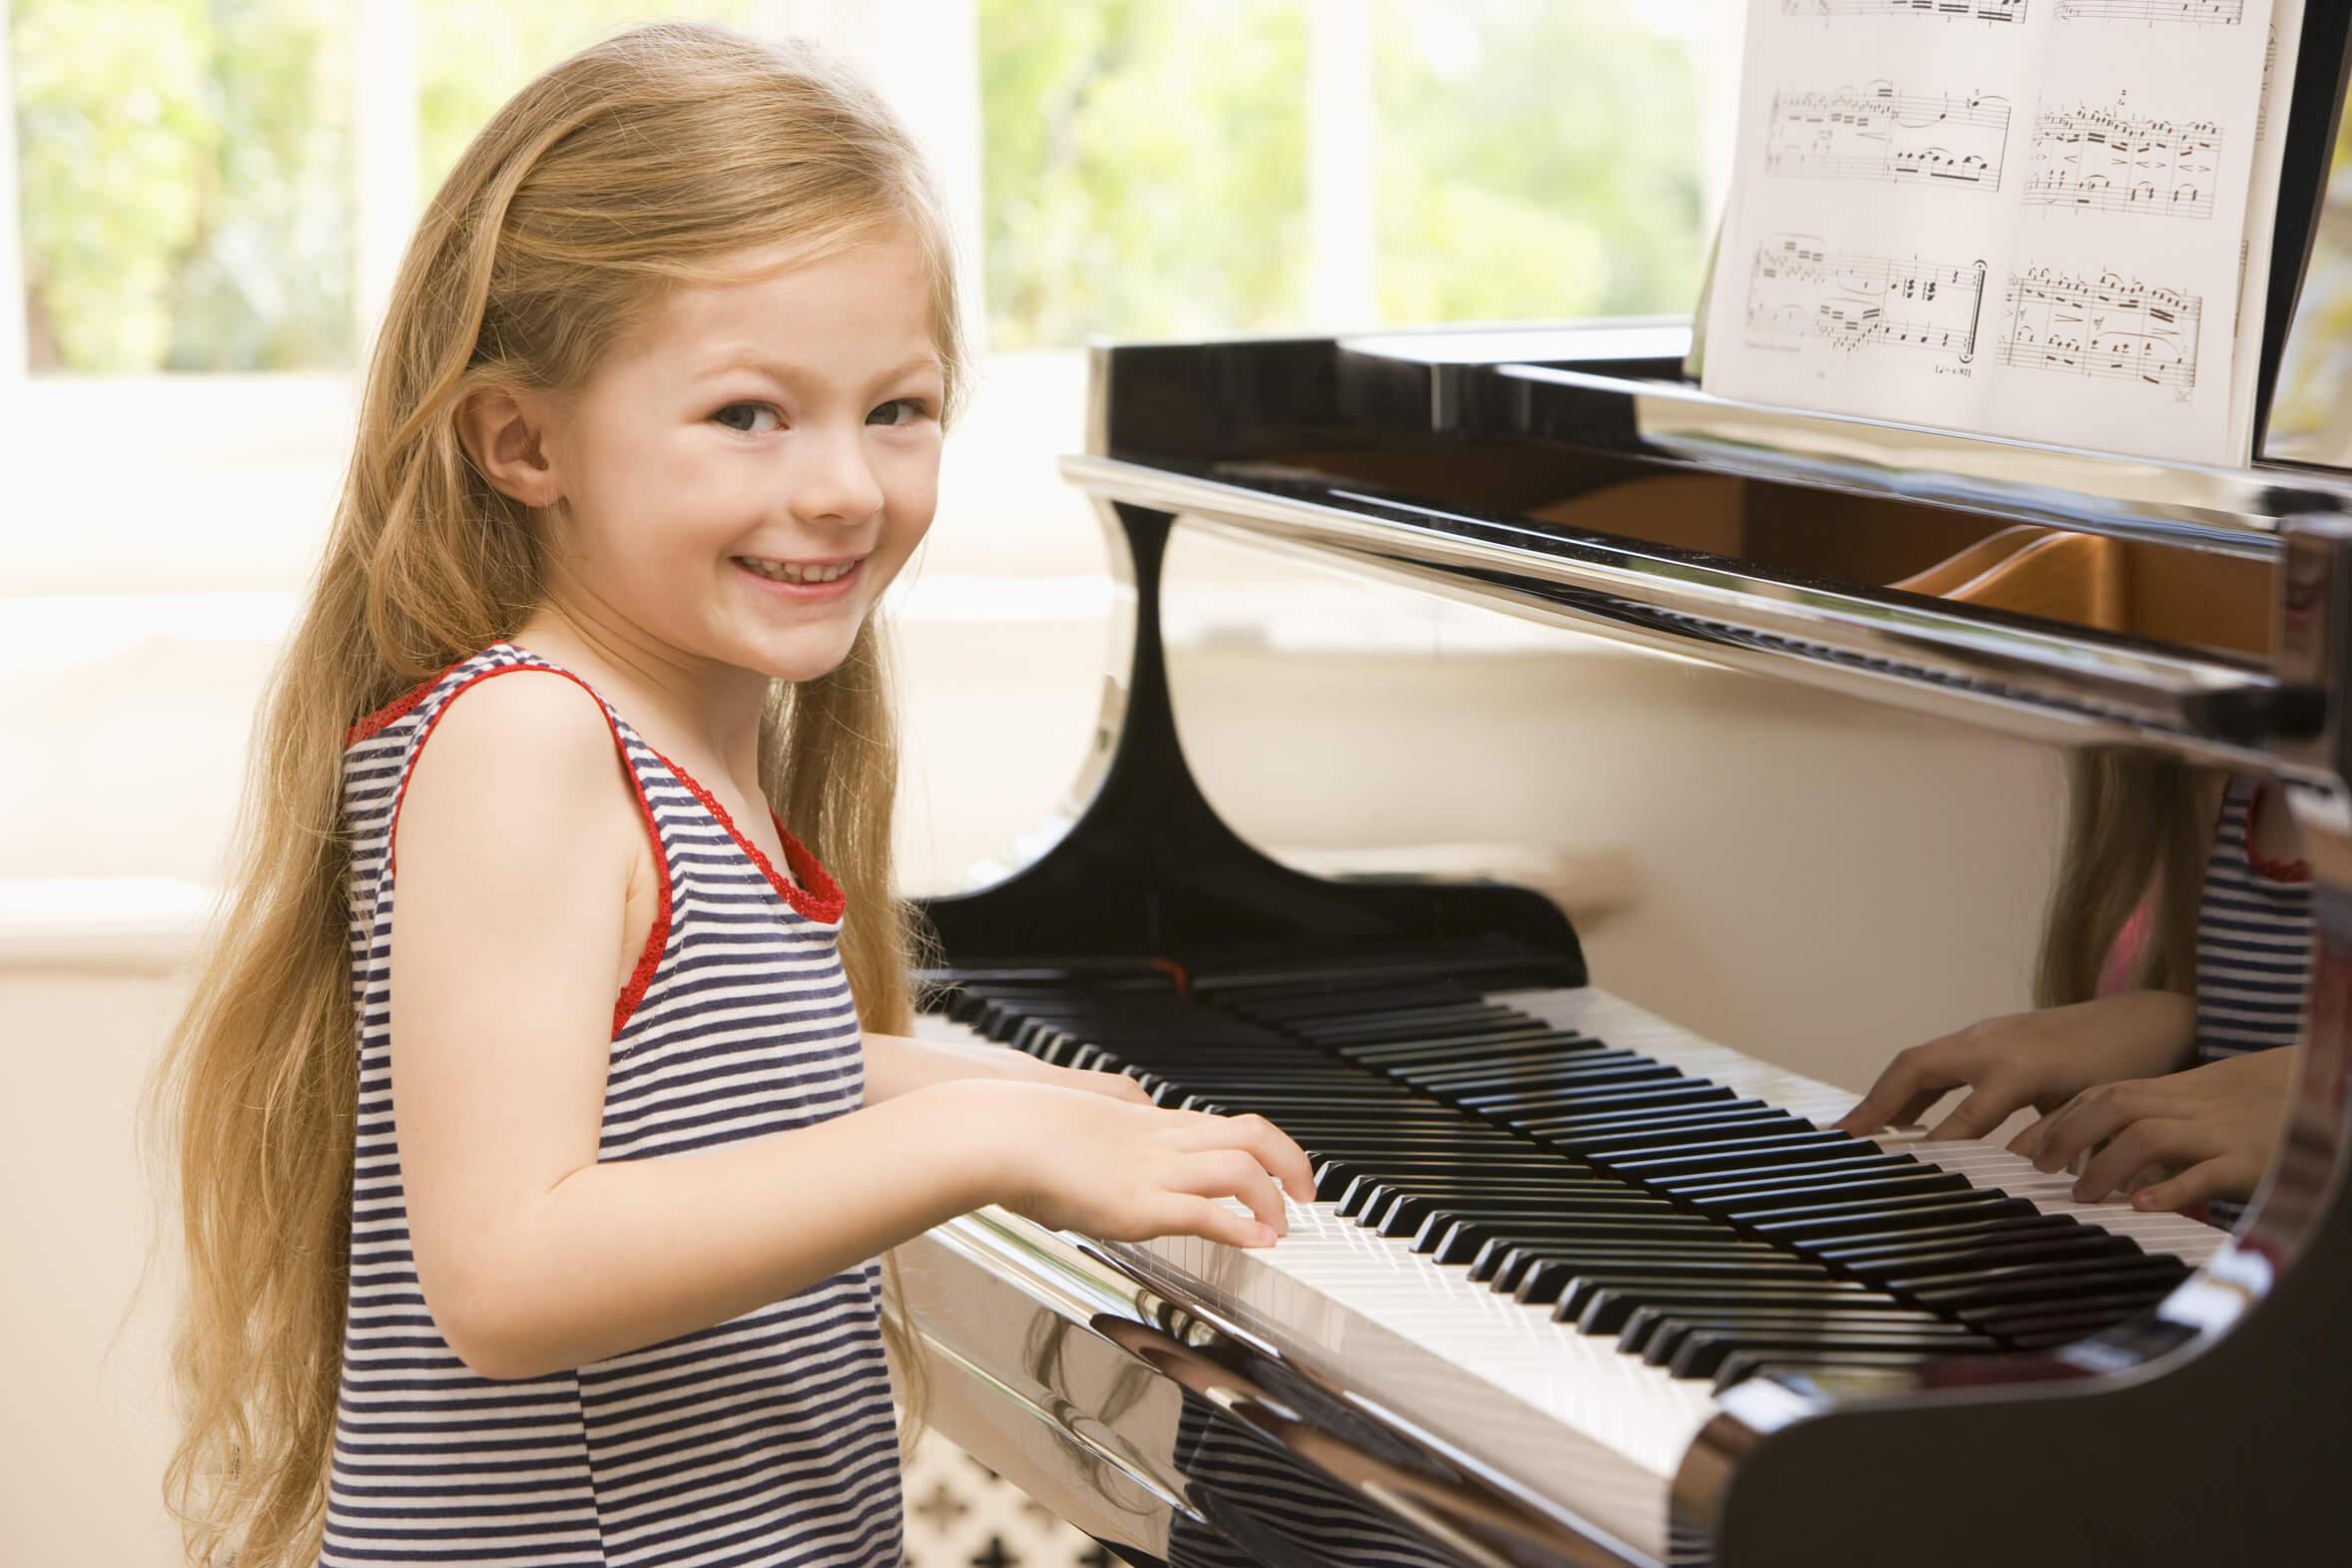 child childrens music school - HD2356×1571